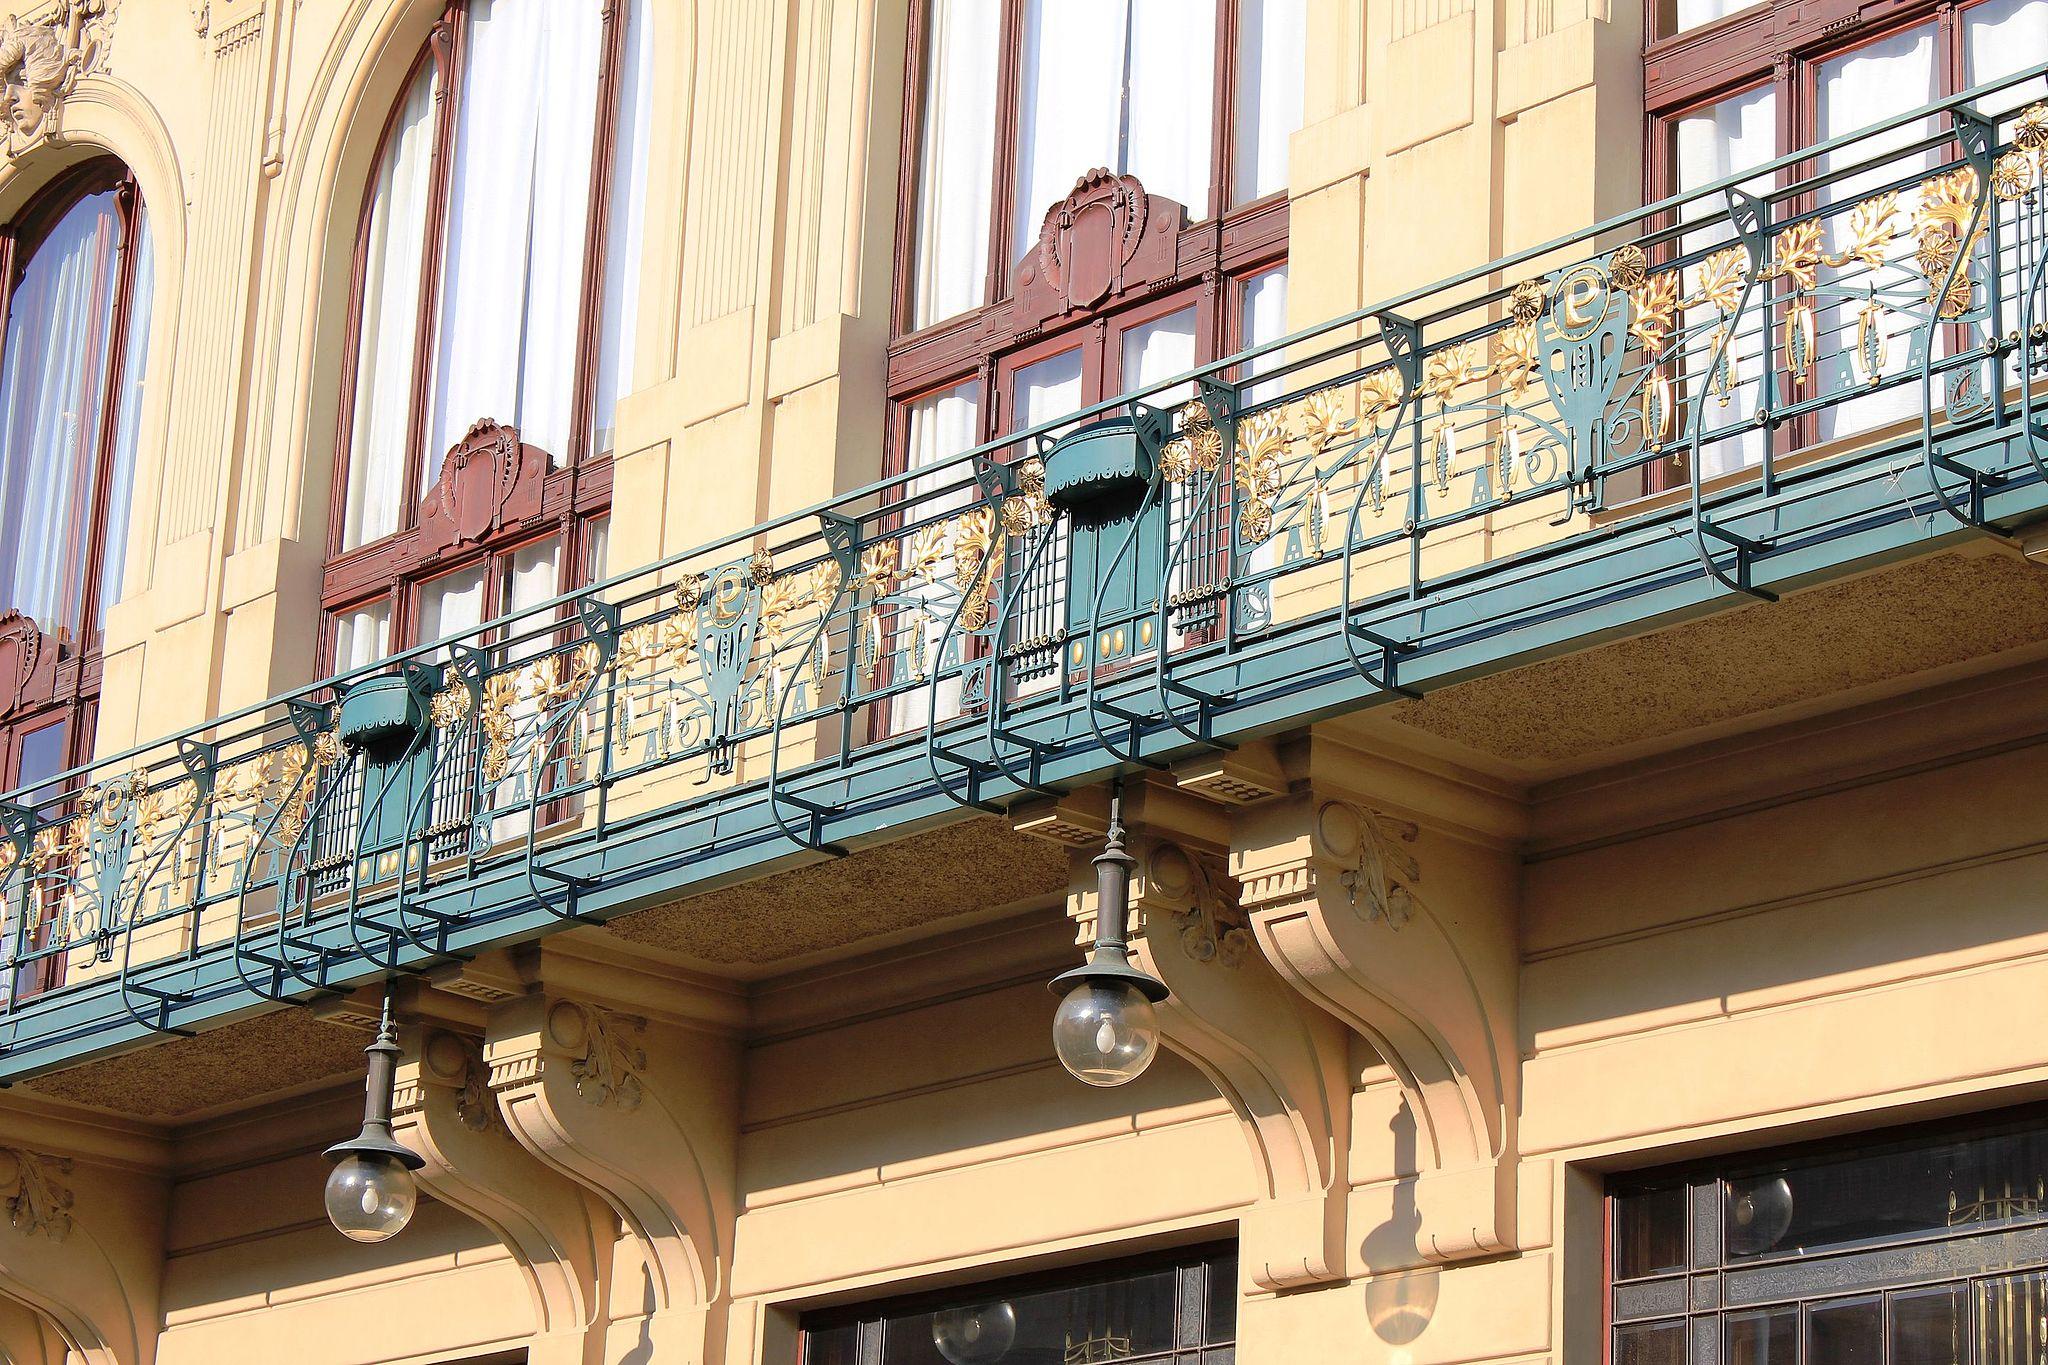 Obecni Dum, Praga detal